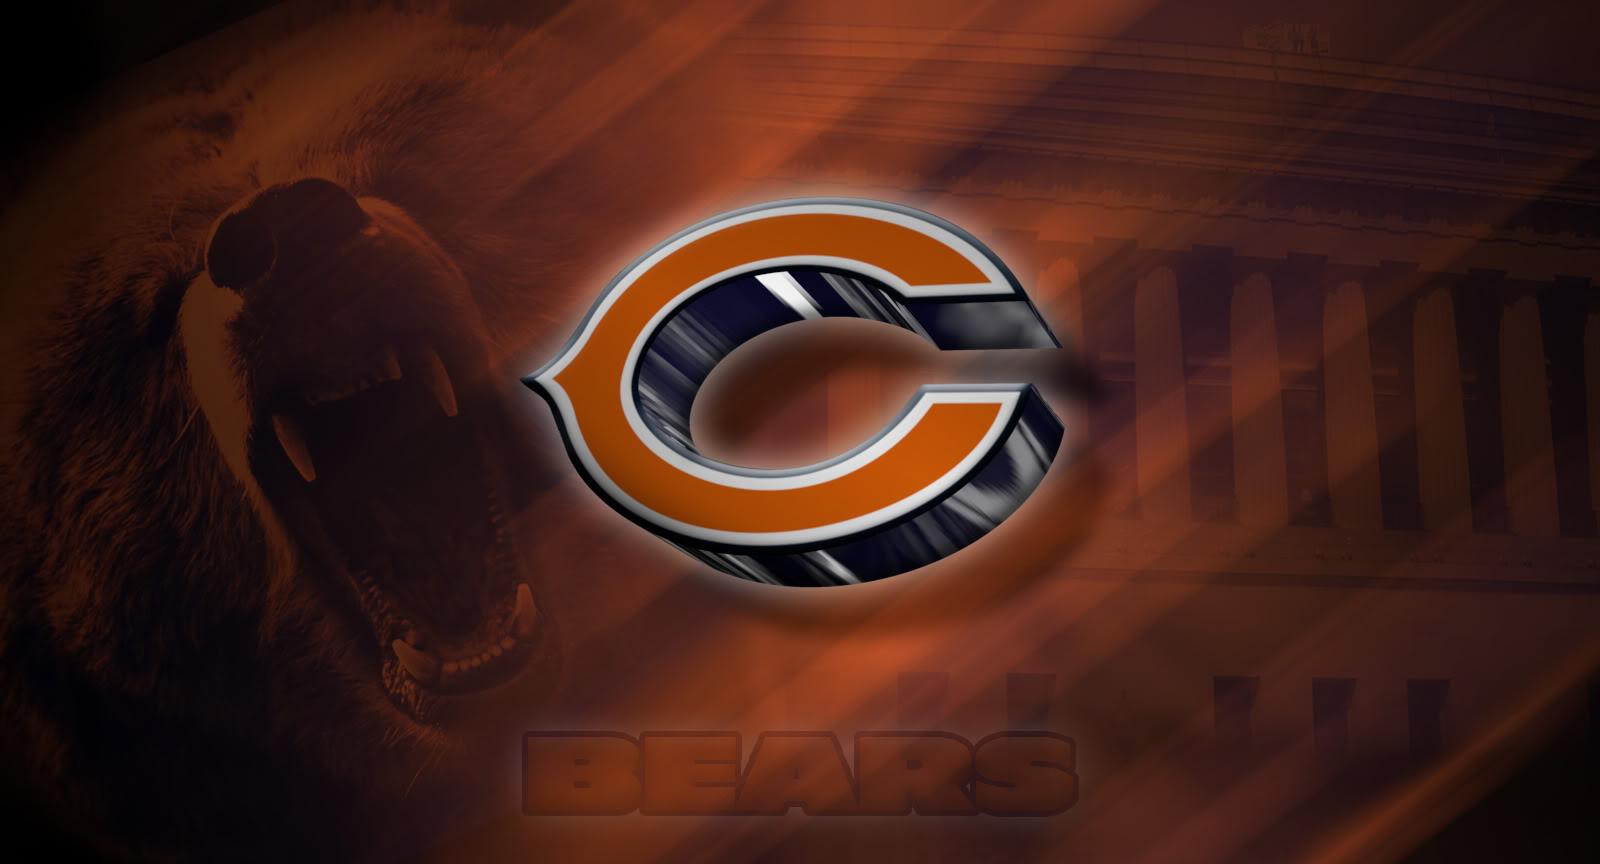 download chicago bears soldier field desktop wallpaper 1600x864